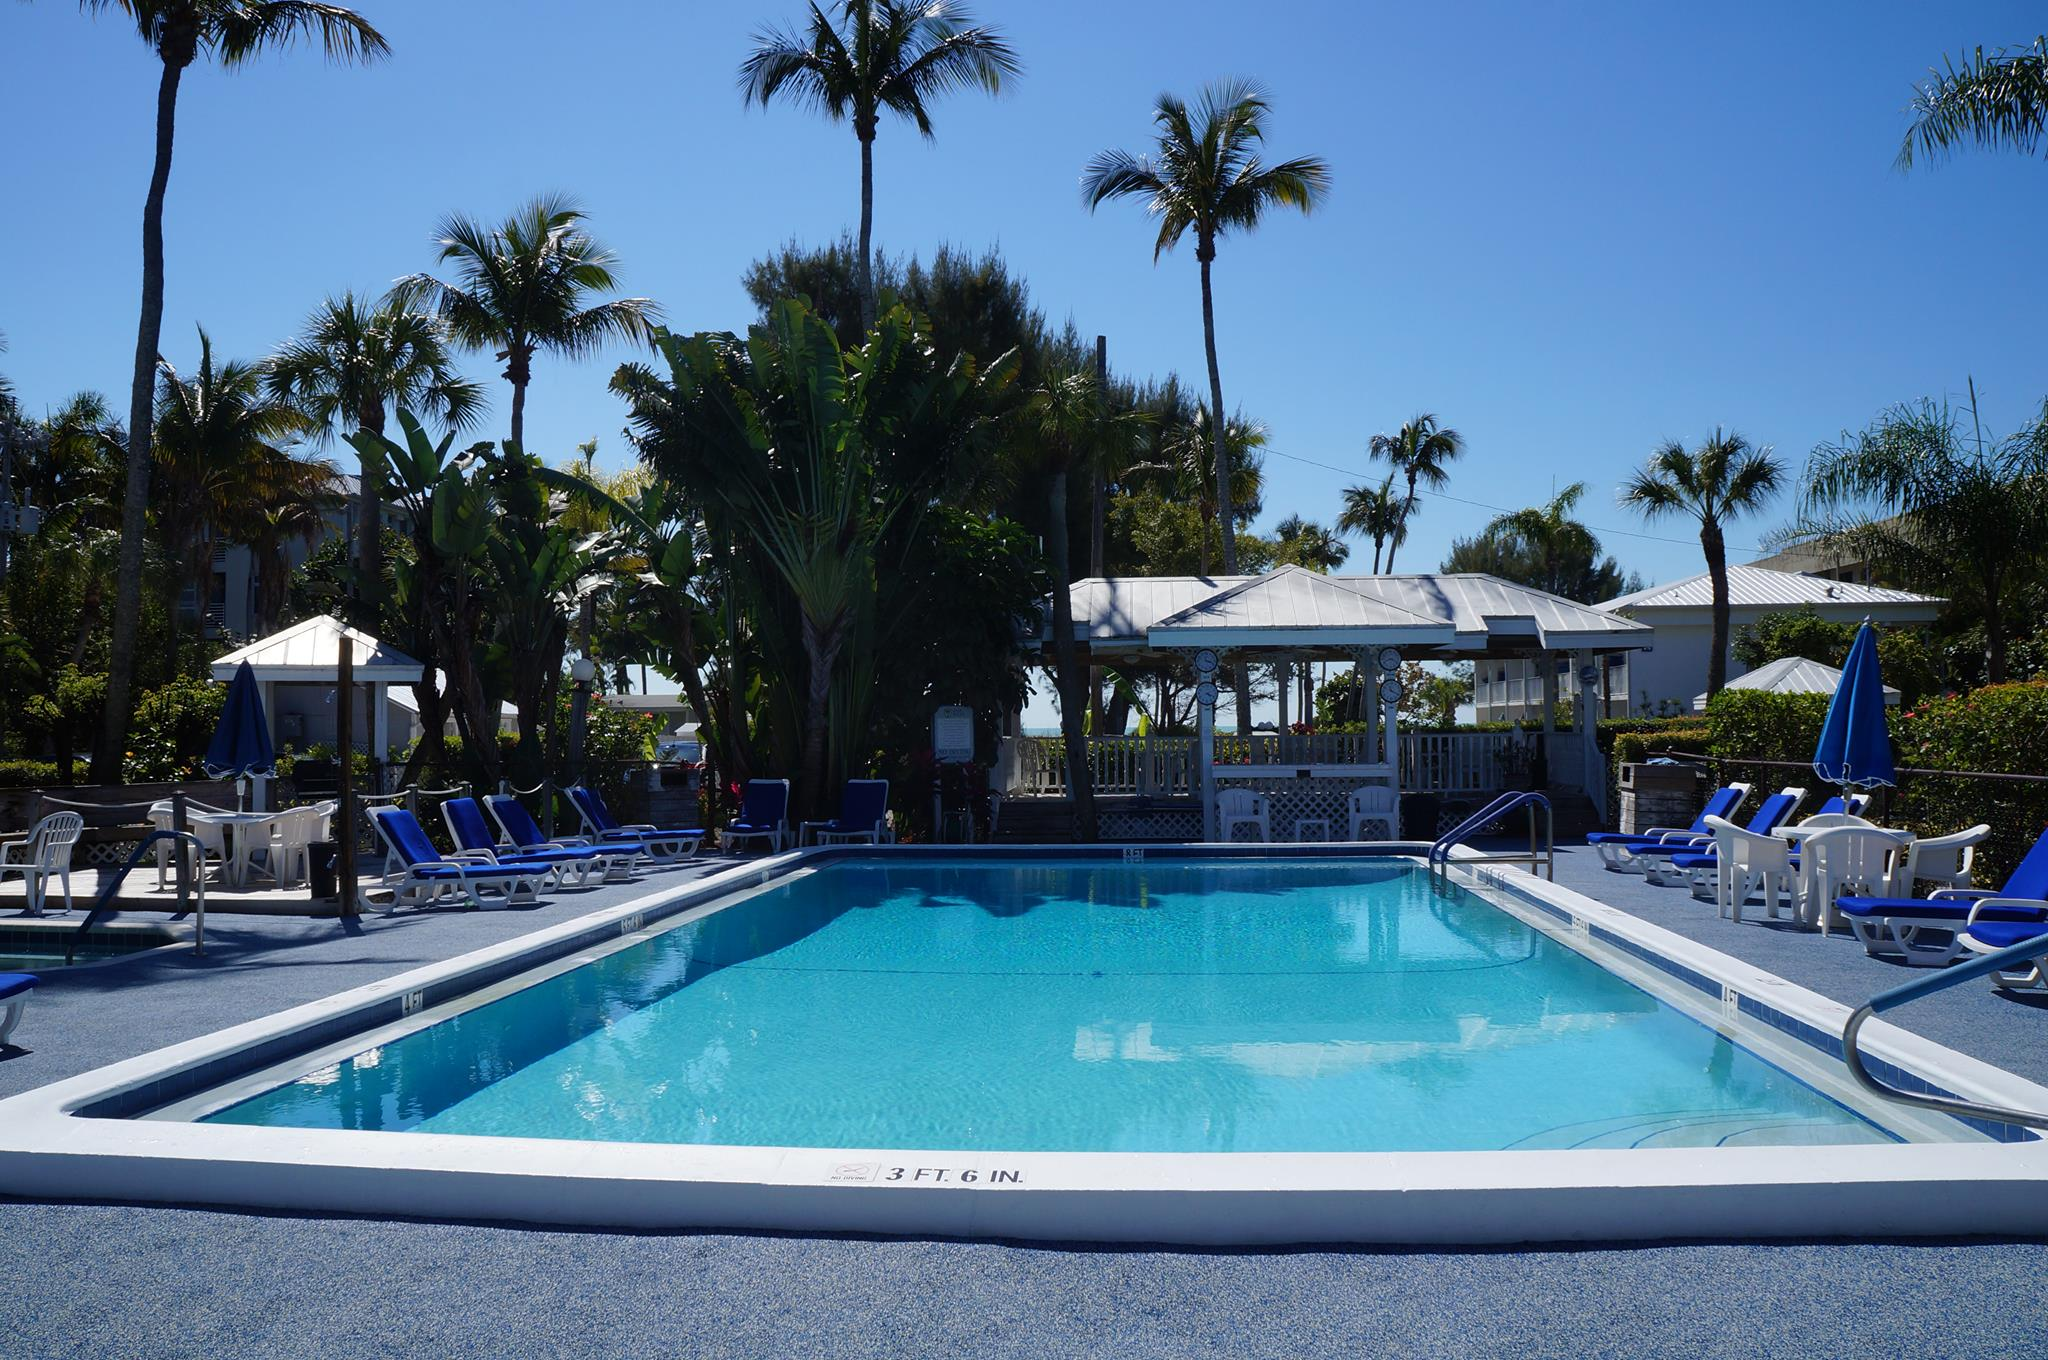 Caribe Beach Resort Sanibel Island